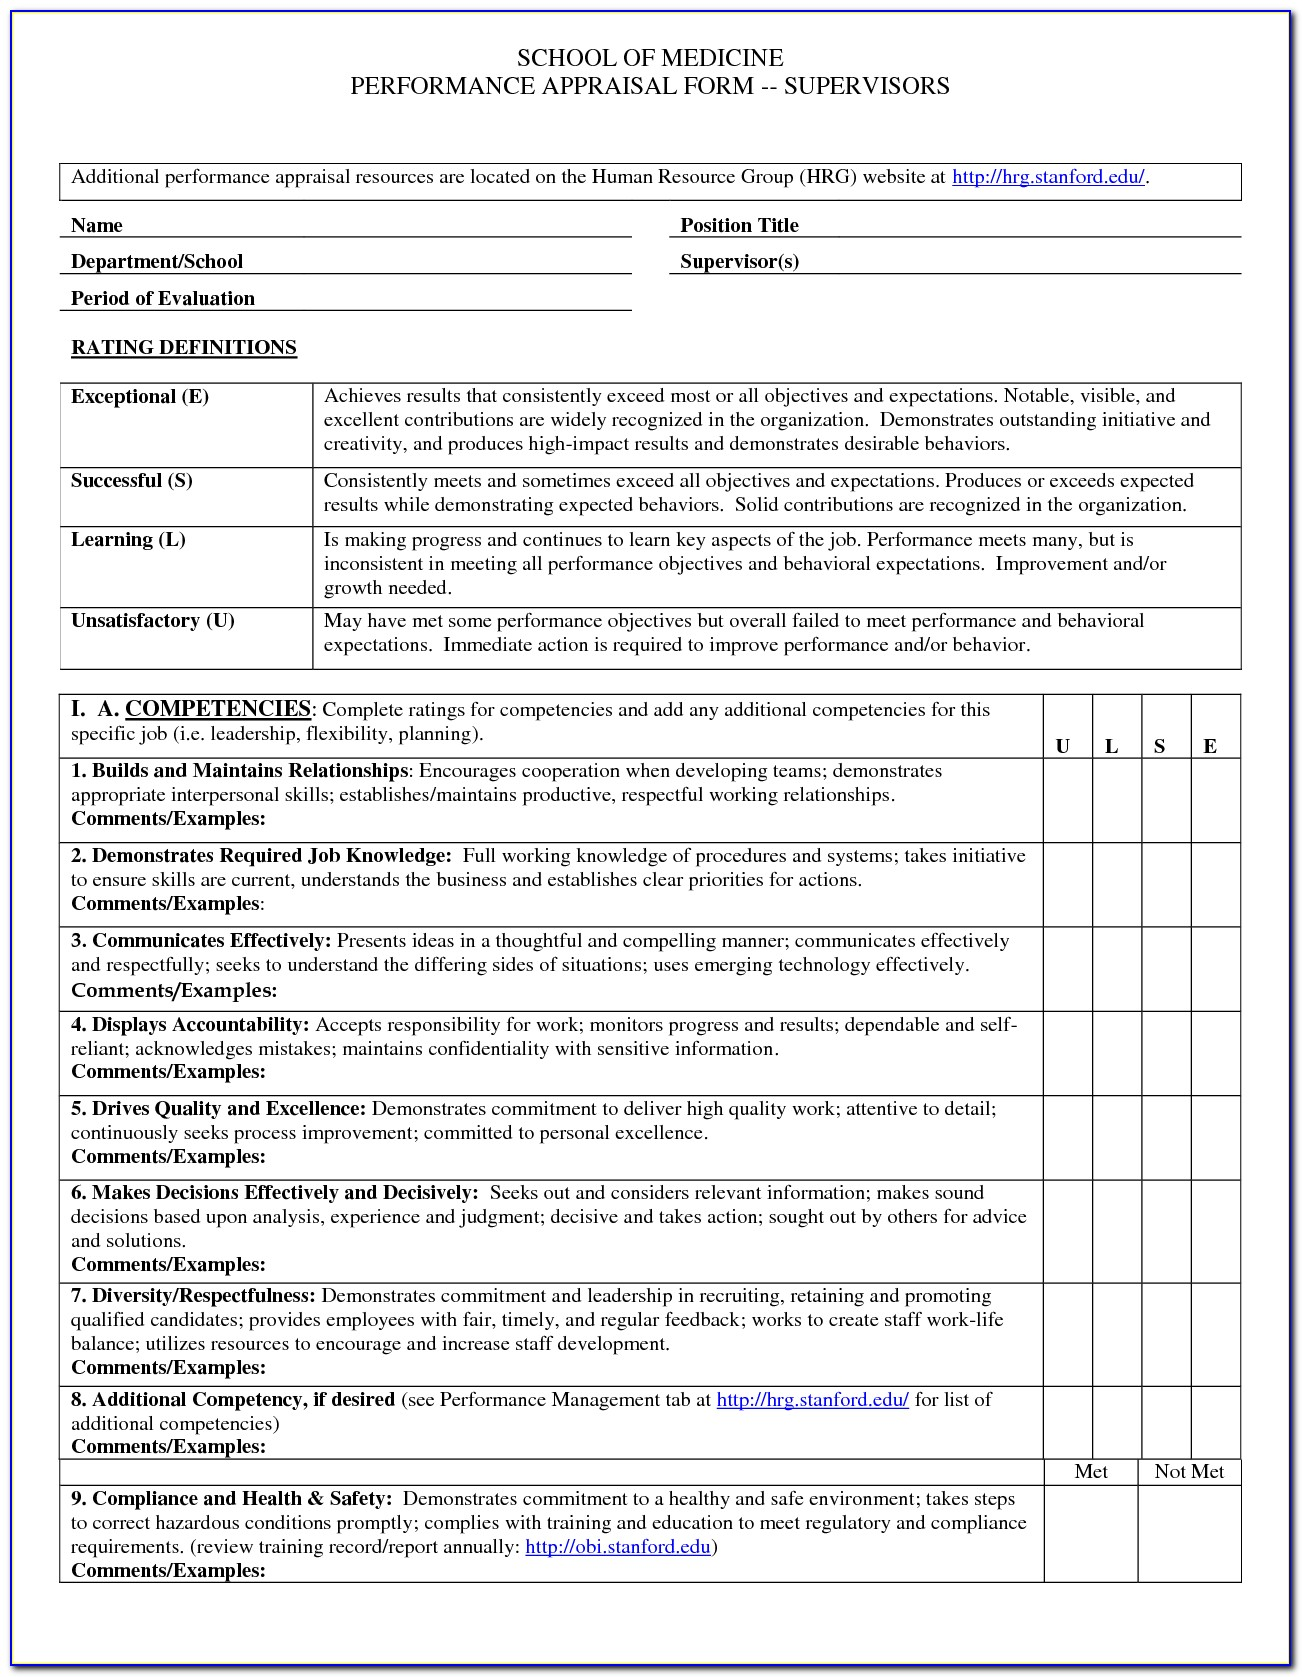 Annual Performance Appraisal Form